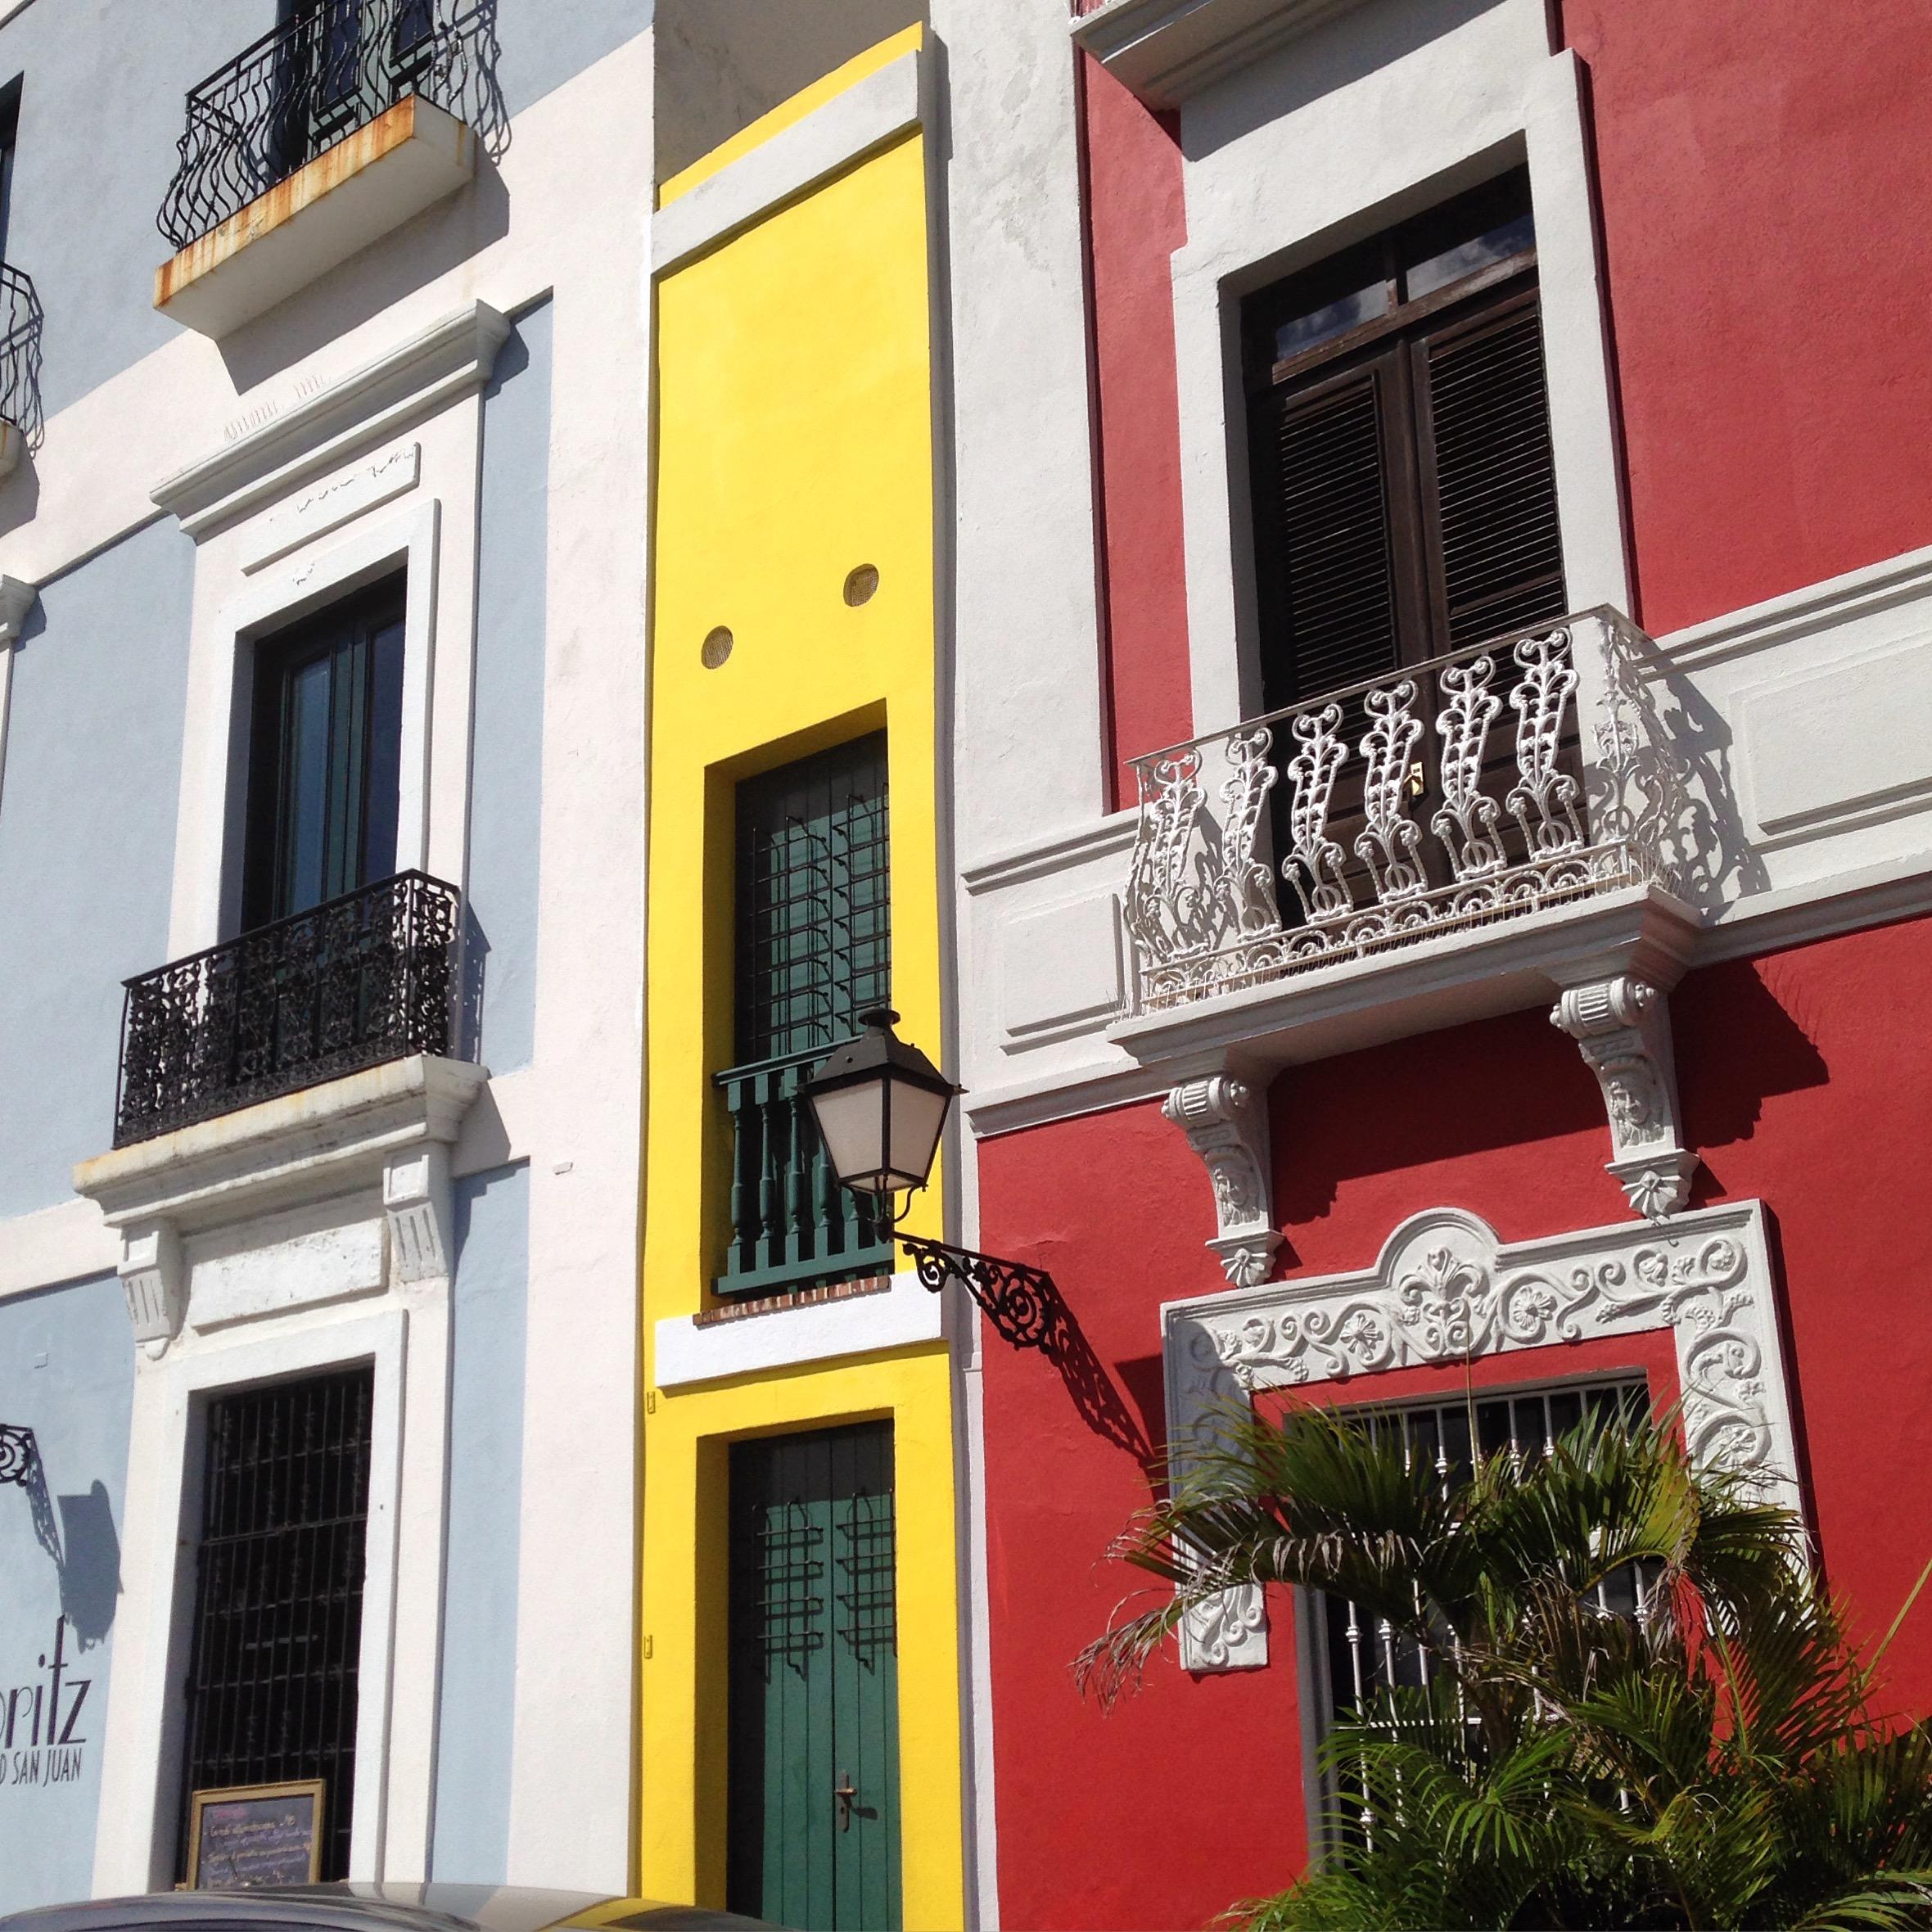 La Casa Estrecha, San Juan PR - One of the narrowest houses in the world.